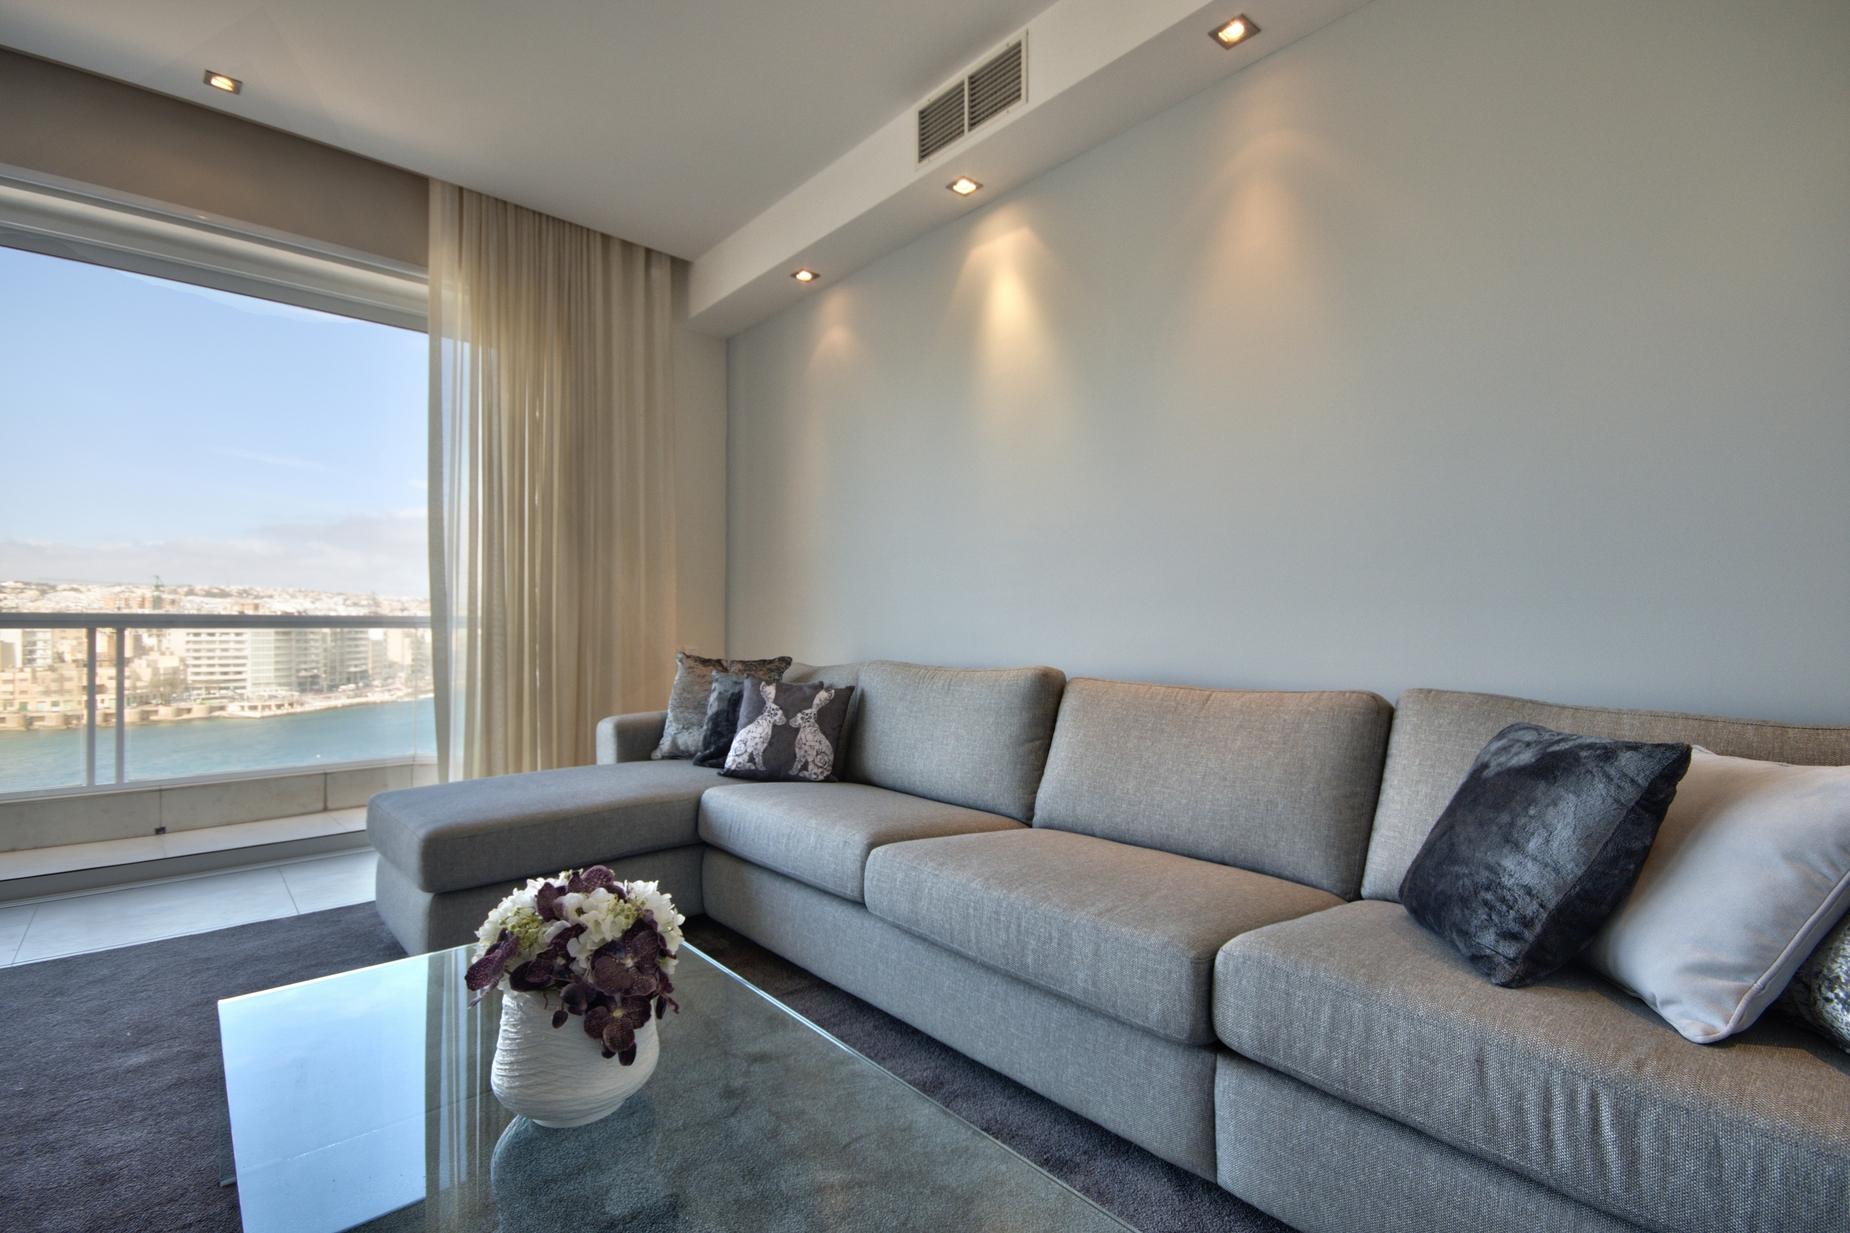 3 bed Apartment For Rent in Sliema, Sliema - thumb 6